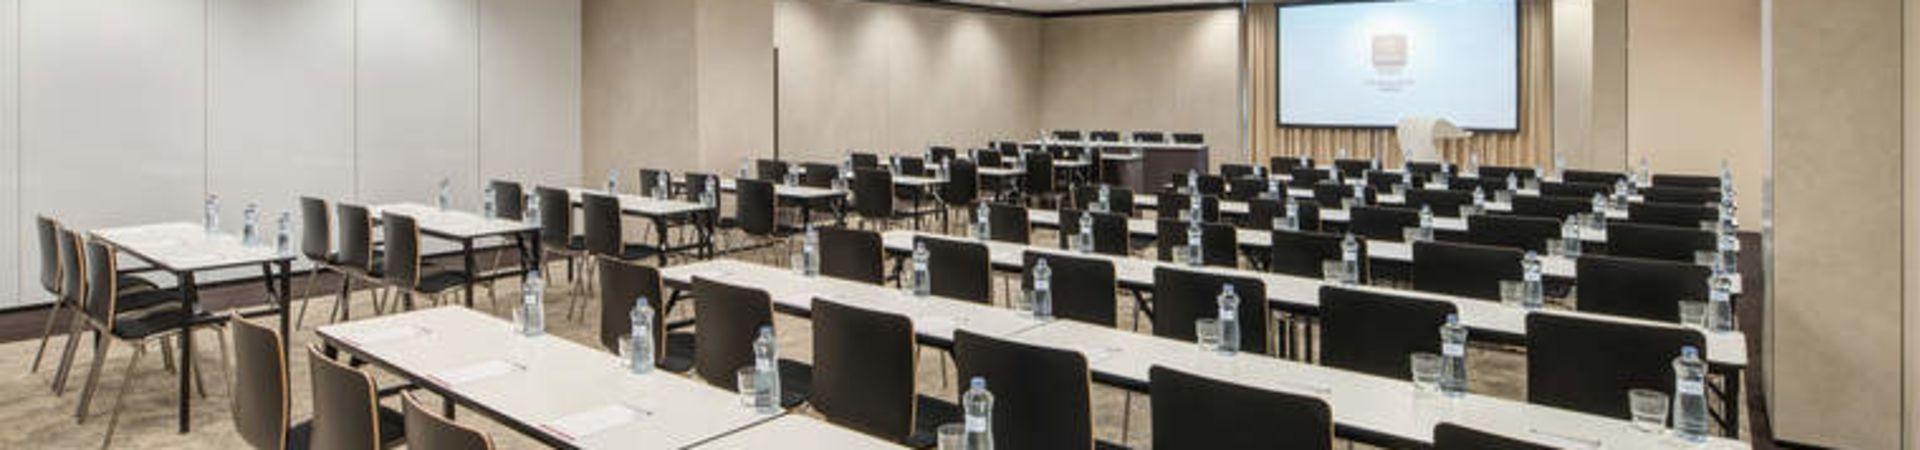 Clarion Congress Hotel Prague **** - Kepler